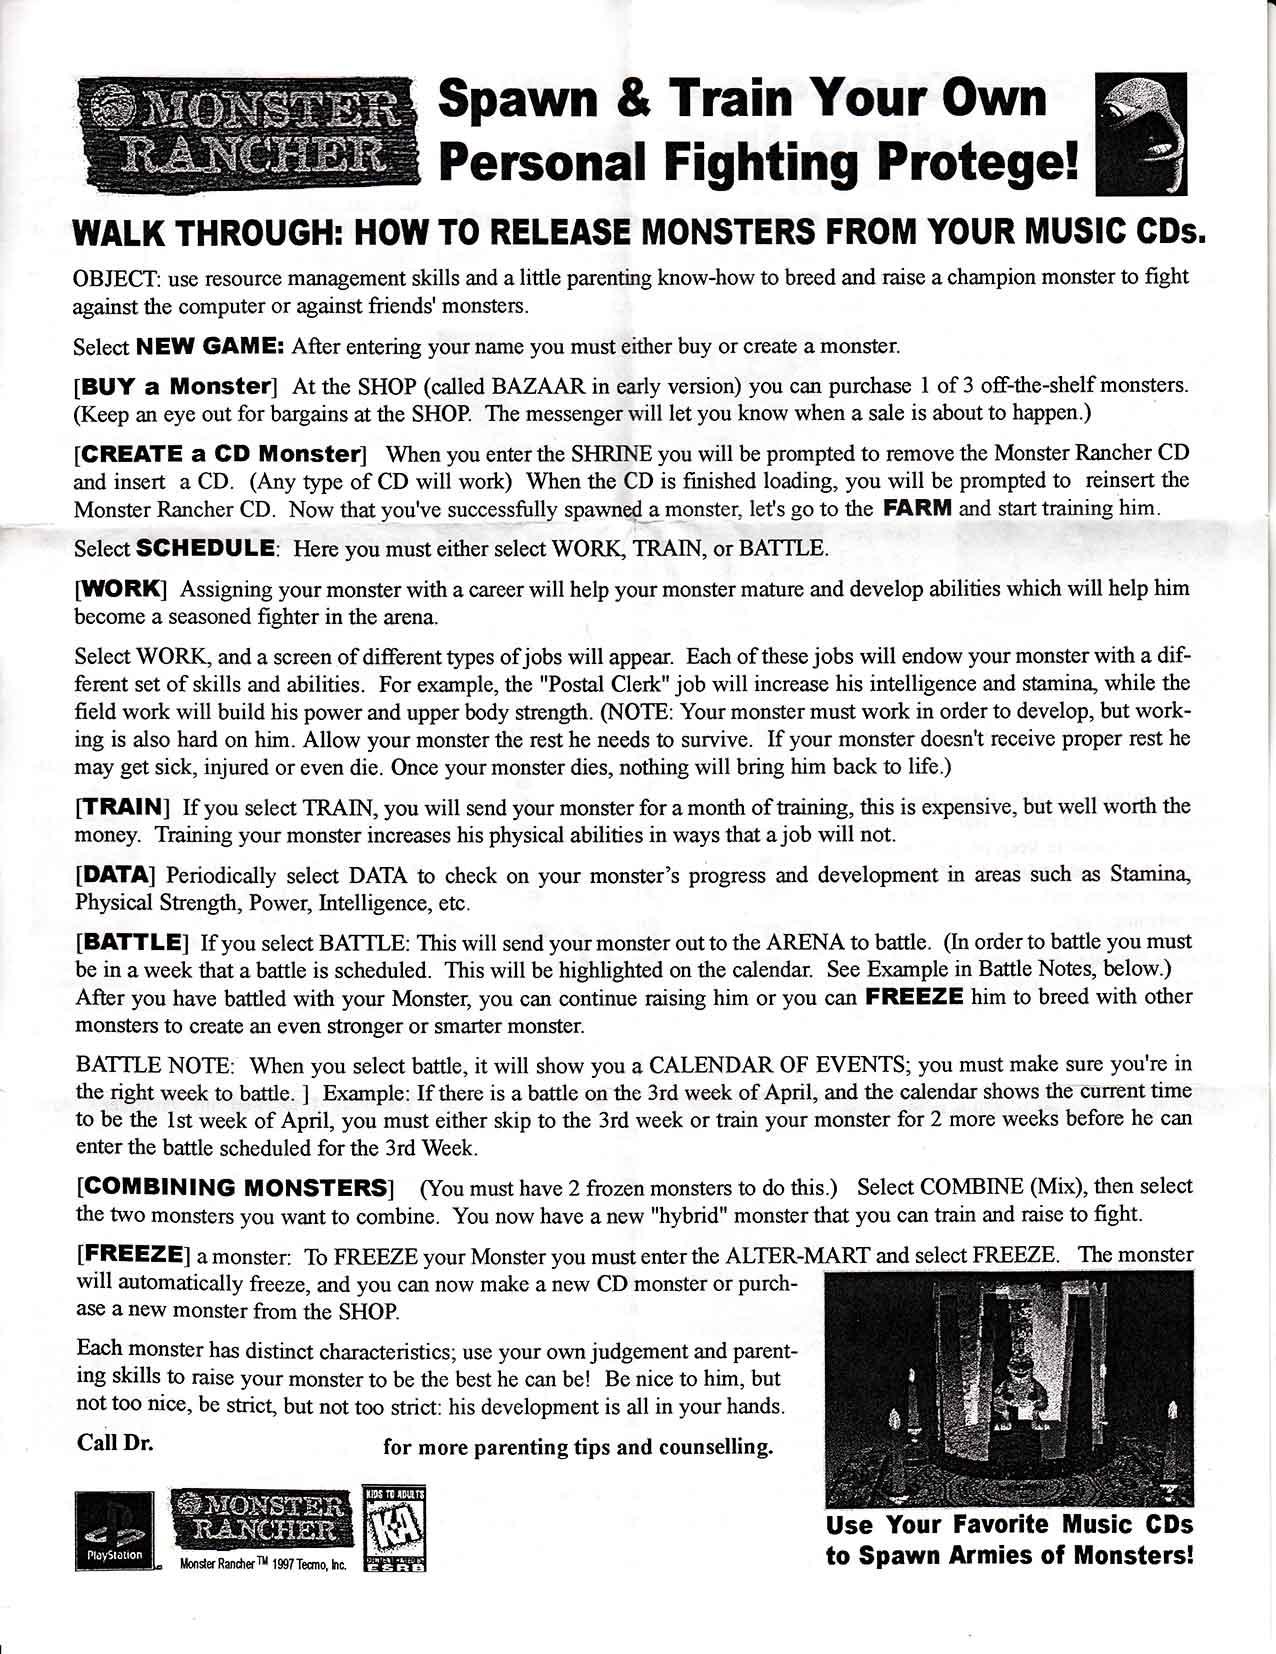 PSX-Trade-Monster-Rancher-News-1-Release